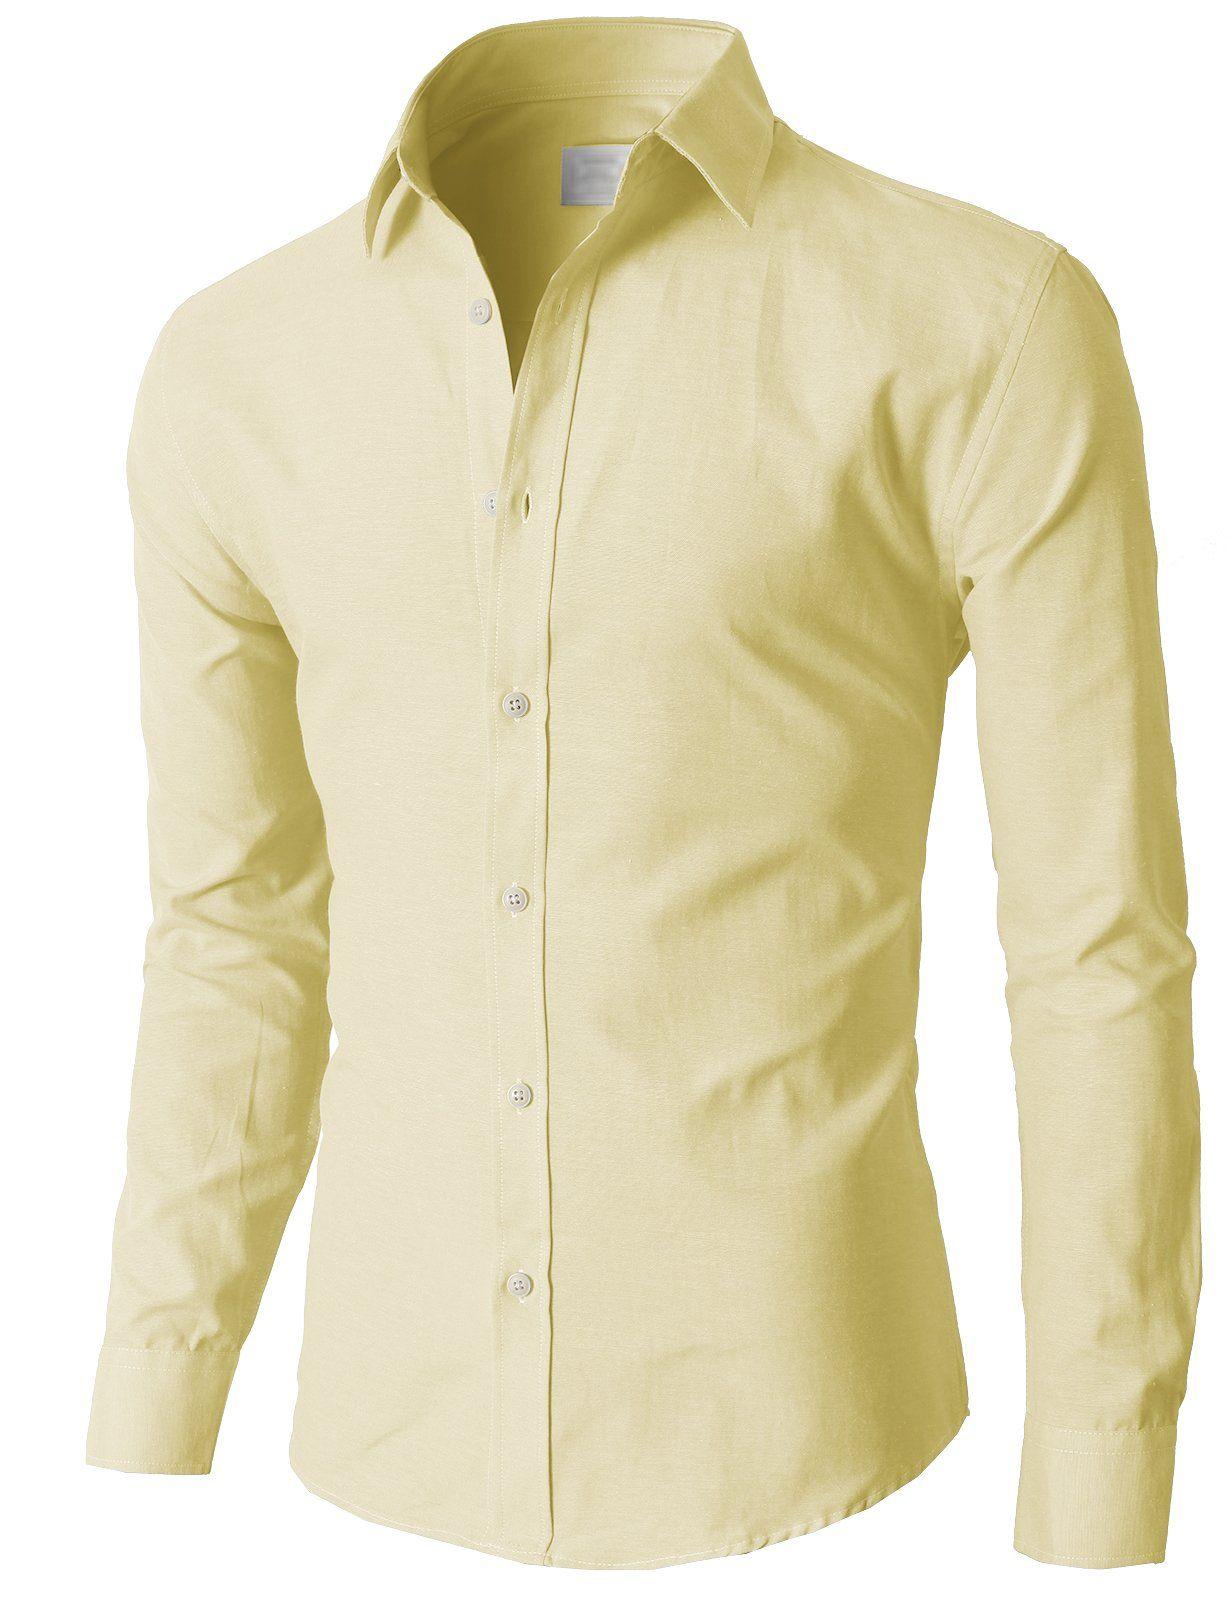 de7890671e2 H2H Mens Oxford Cotton Slim Fit Dress Button-down Shirts Long Sleeve at  Amazon Men s Clothing store